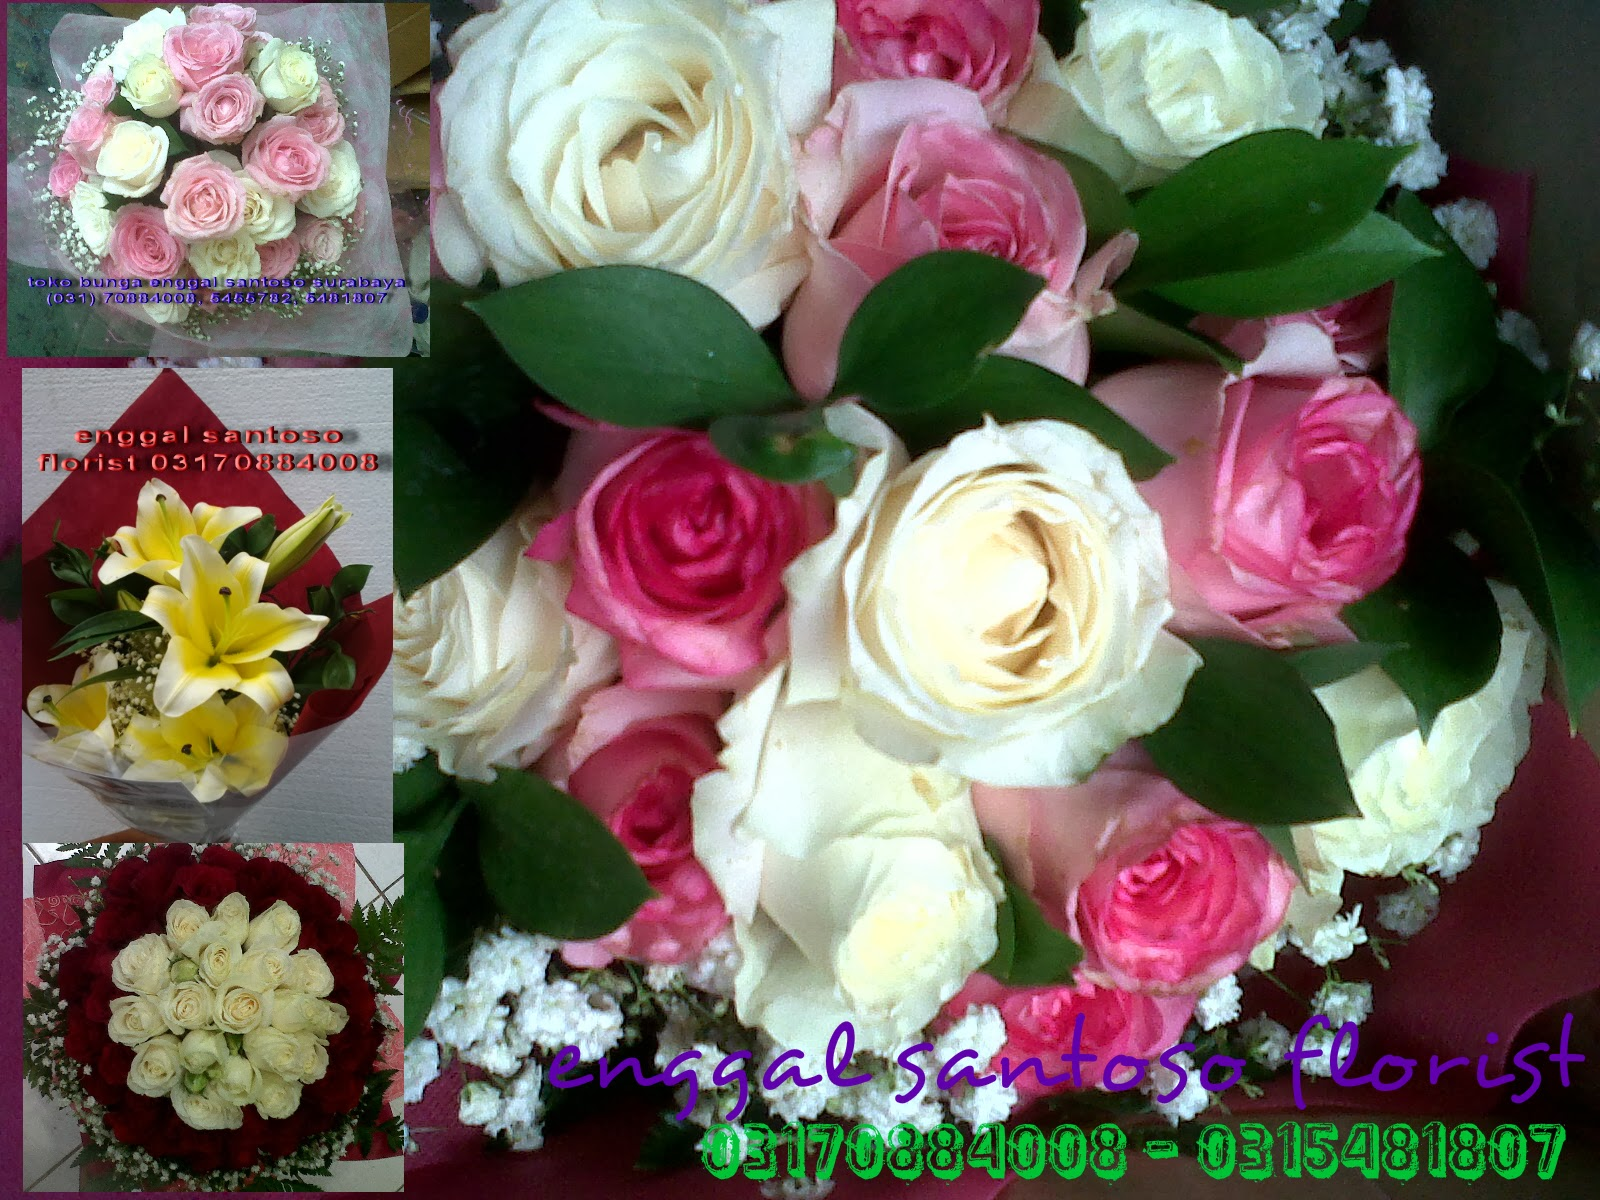 toko bunga dan florist online di kayon surabaya